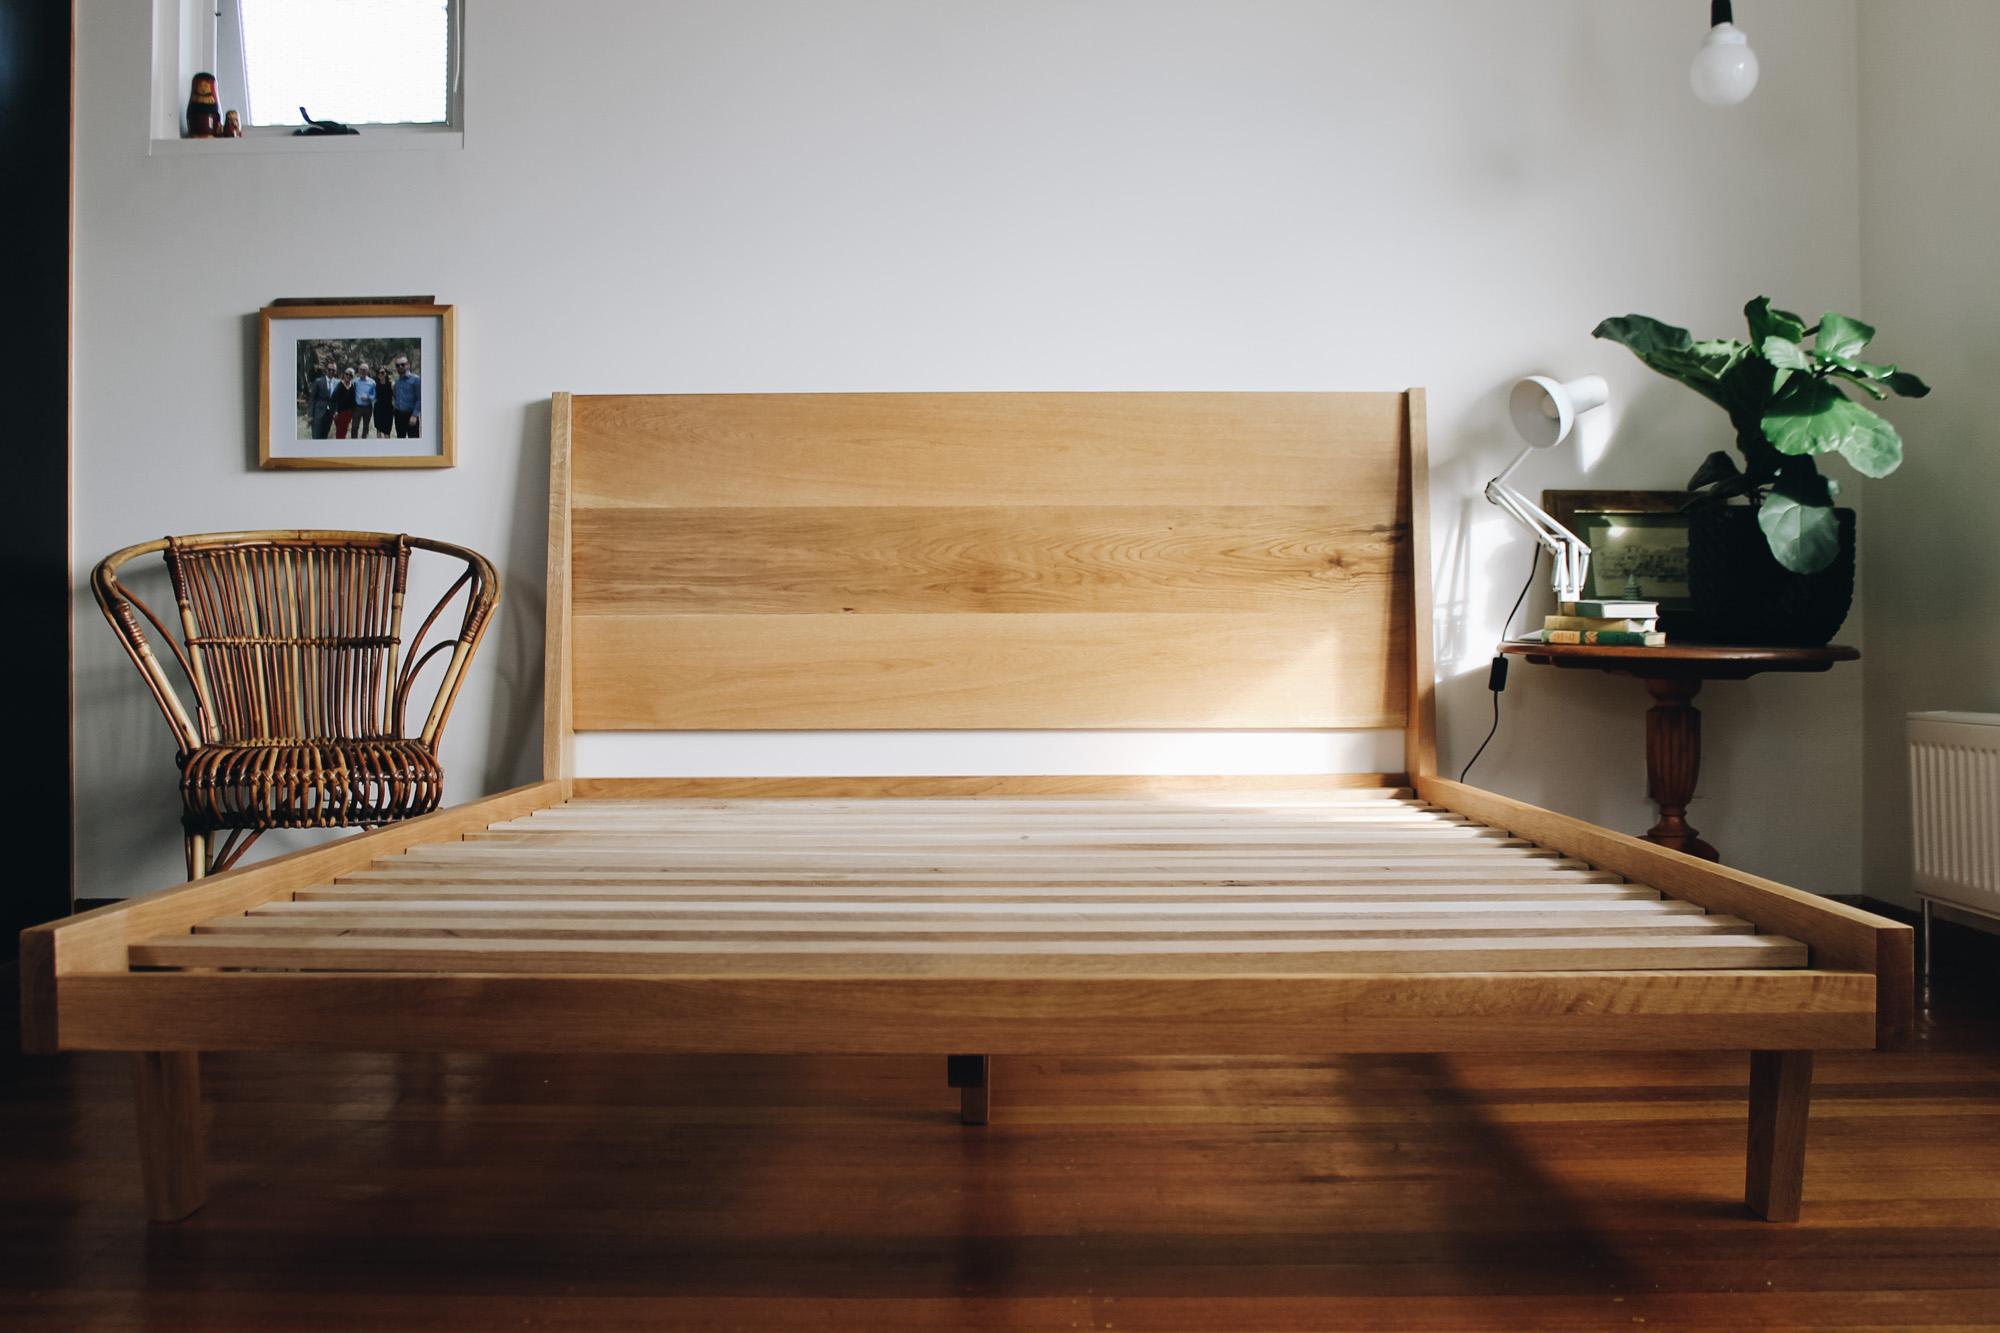 Al and Imo Handmade-mod-bed-custom-american-oak-bed-frame-mid-century-inspired-surf-coast-melbourne-australia-21.jpg